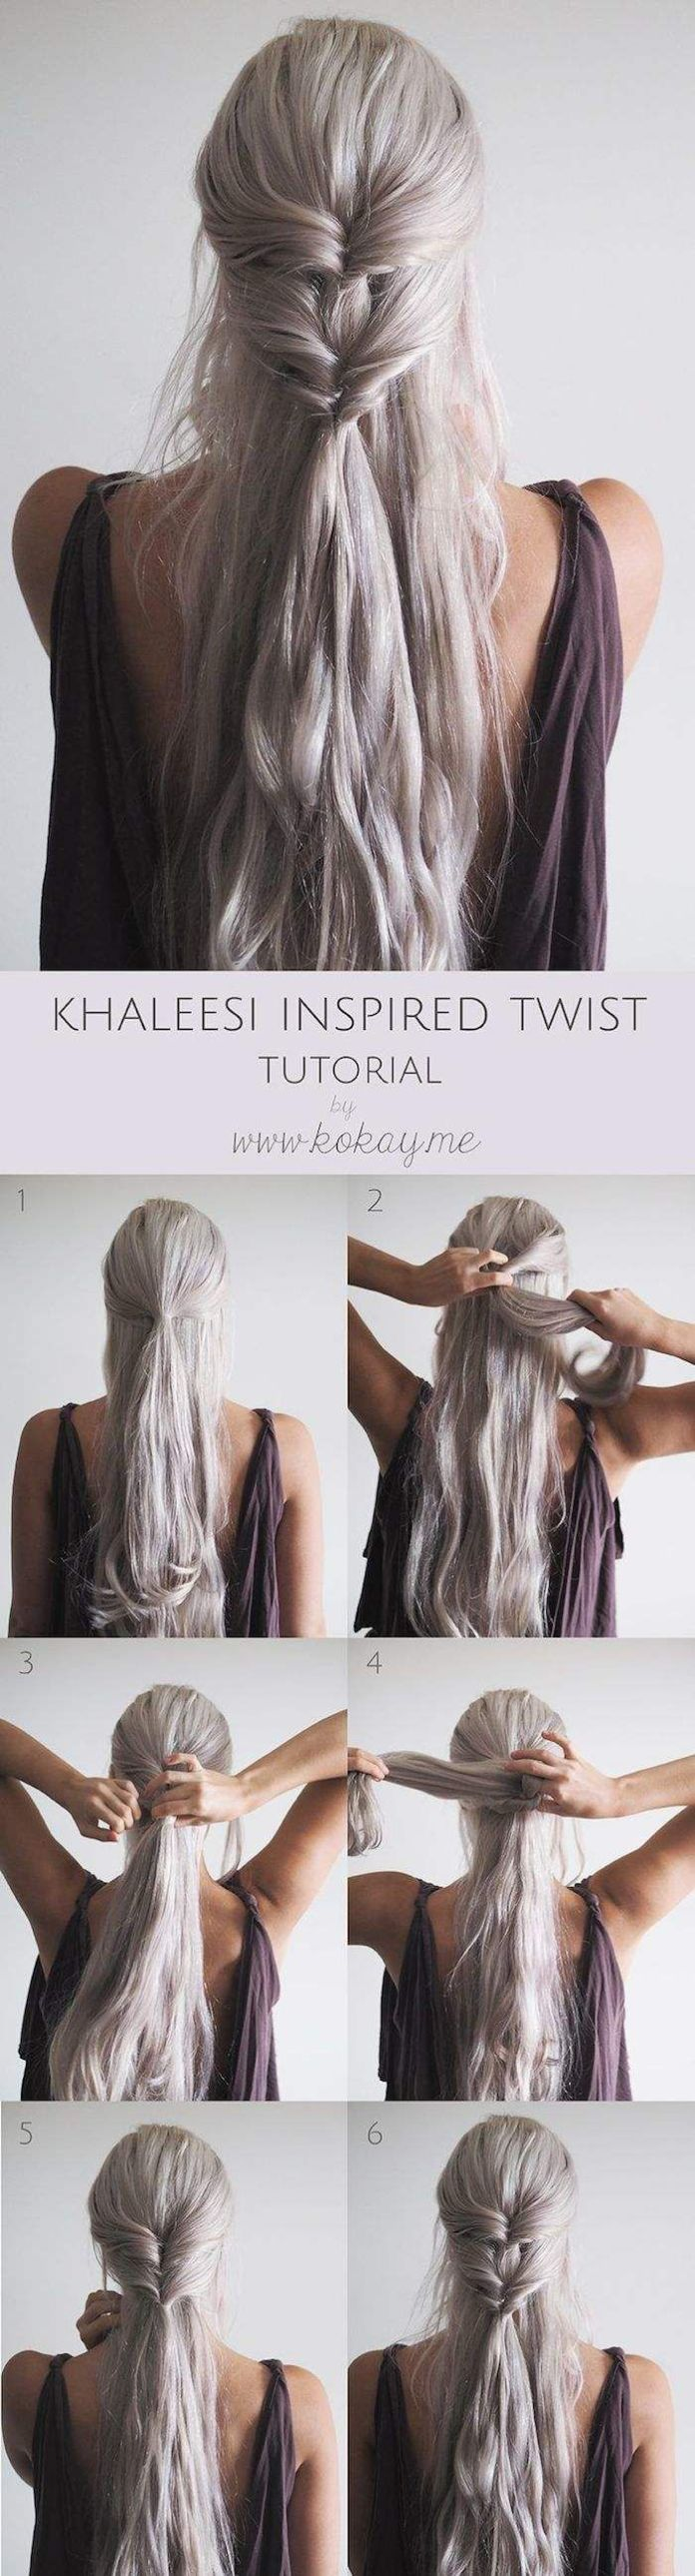 Adorable-Wedding-Hair Hair Tutorials to Style Your Hair